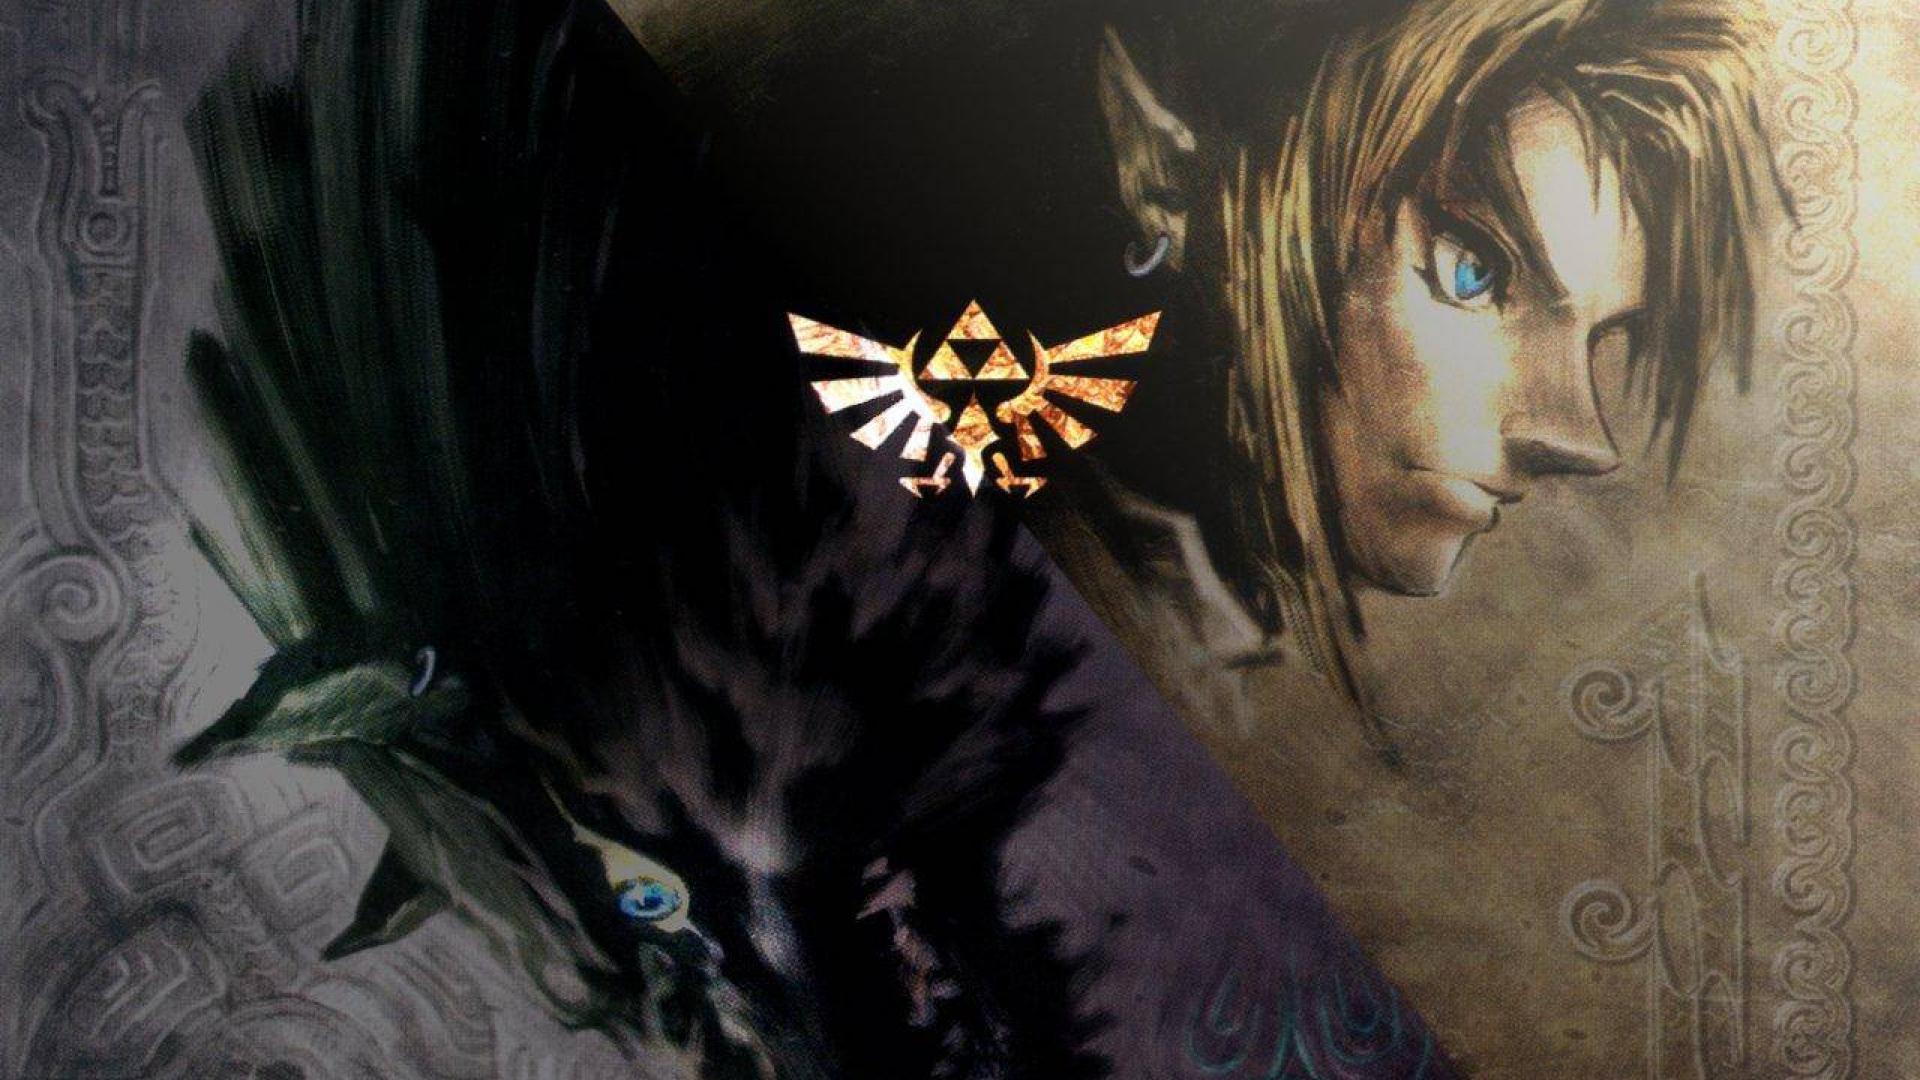 Free Download Download The Legend Of Zelda Twilight Princess